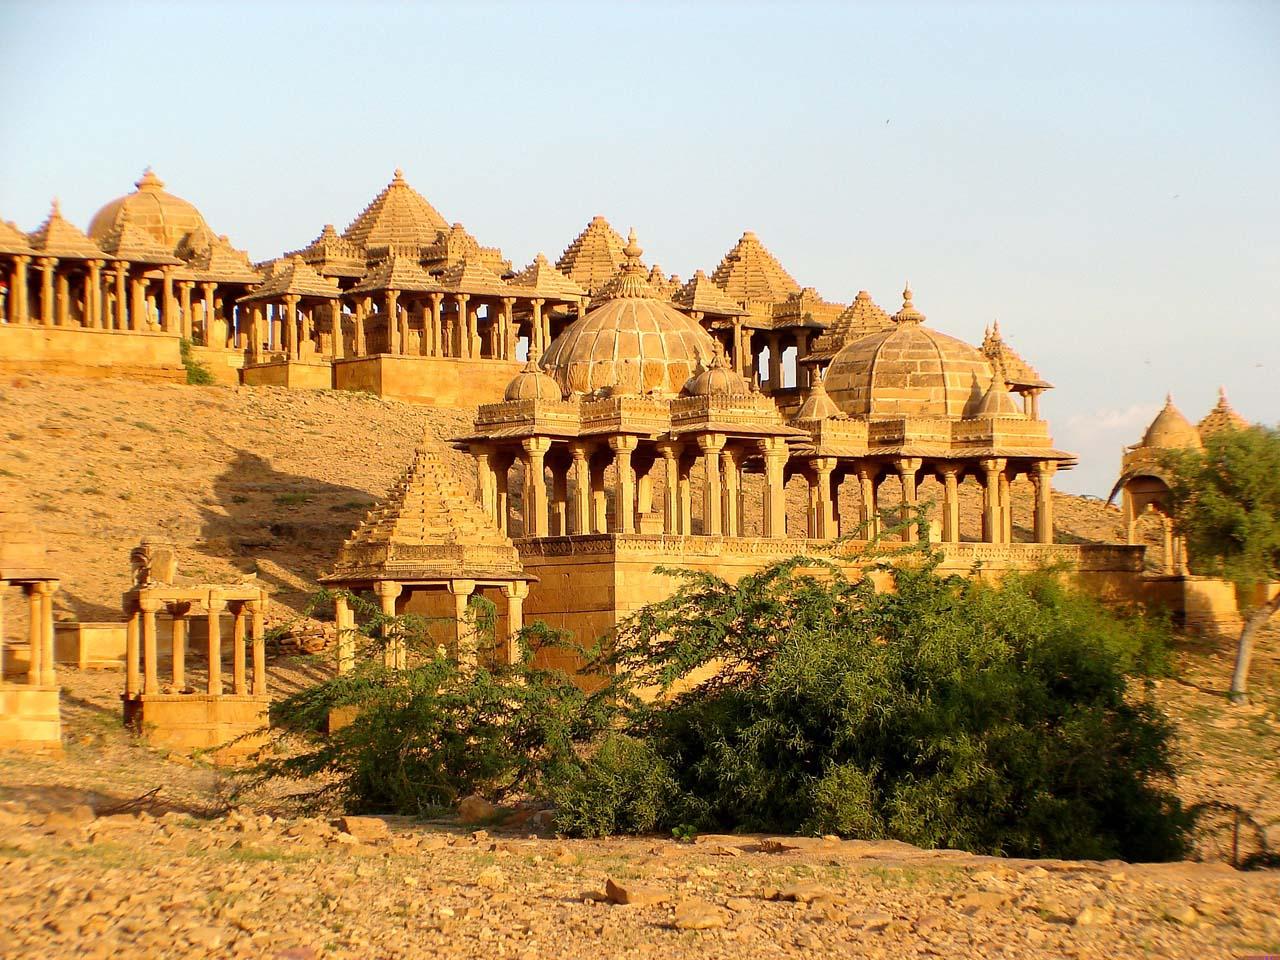 Bada Bagh Jaisalmer